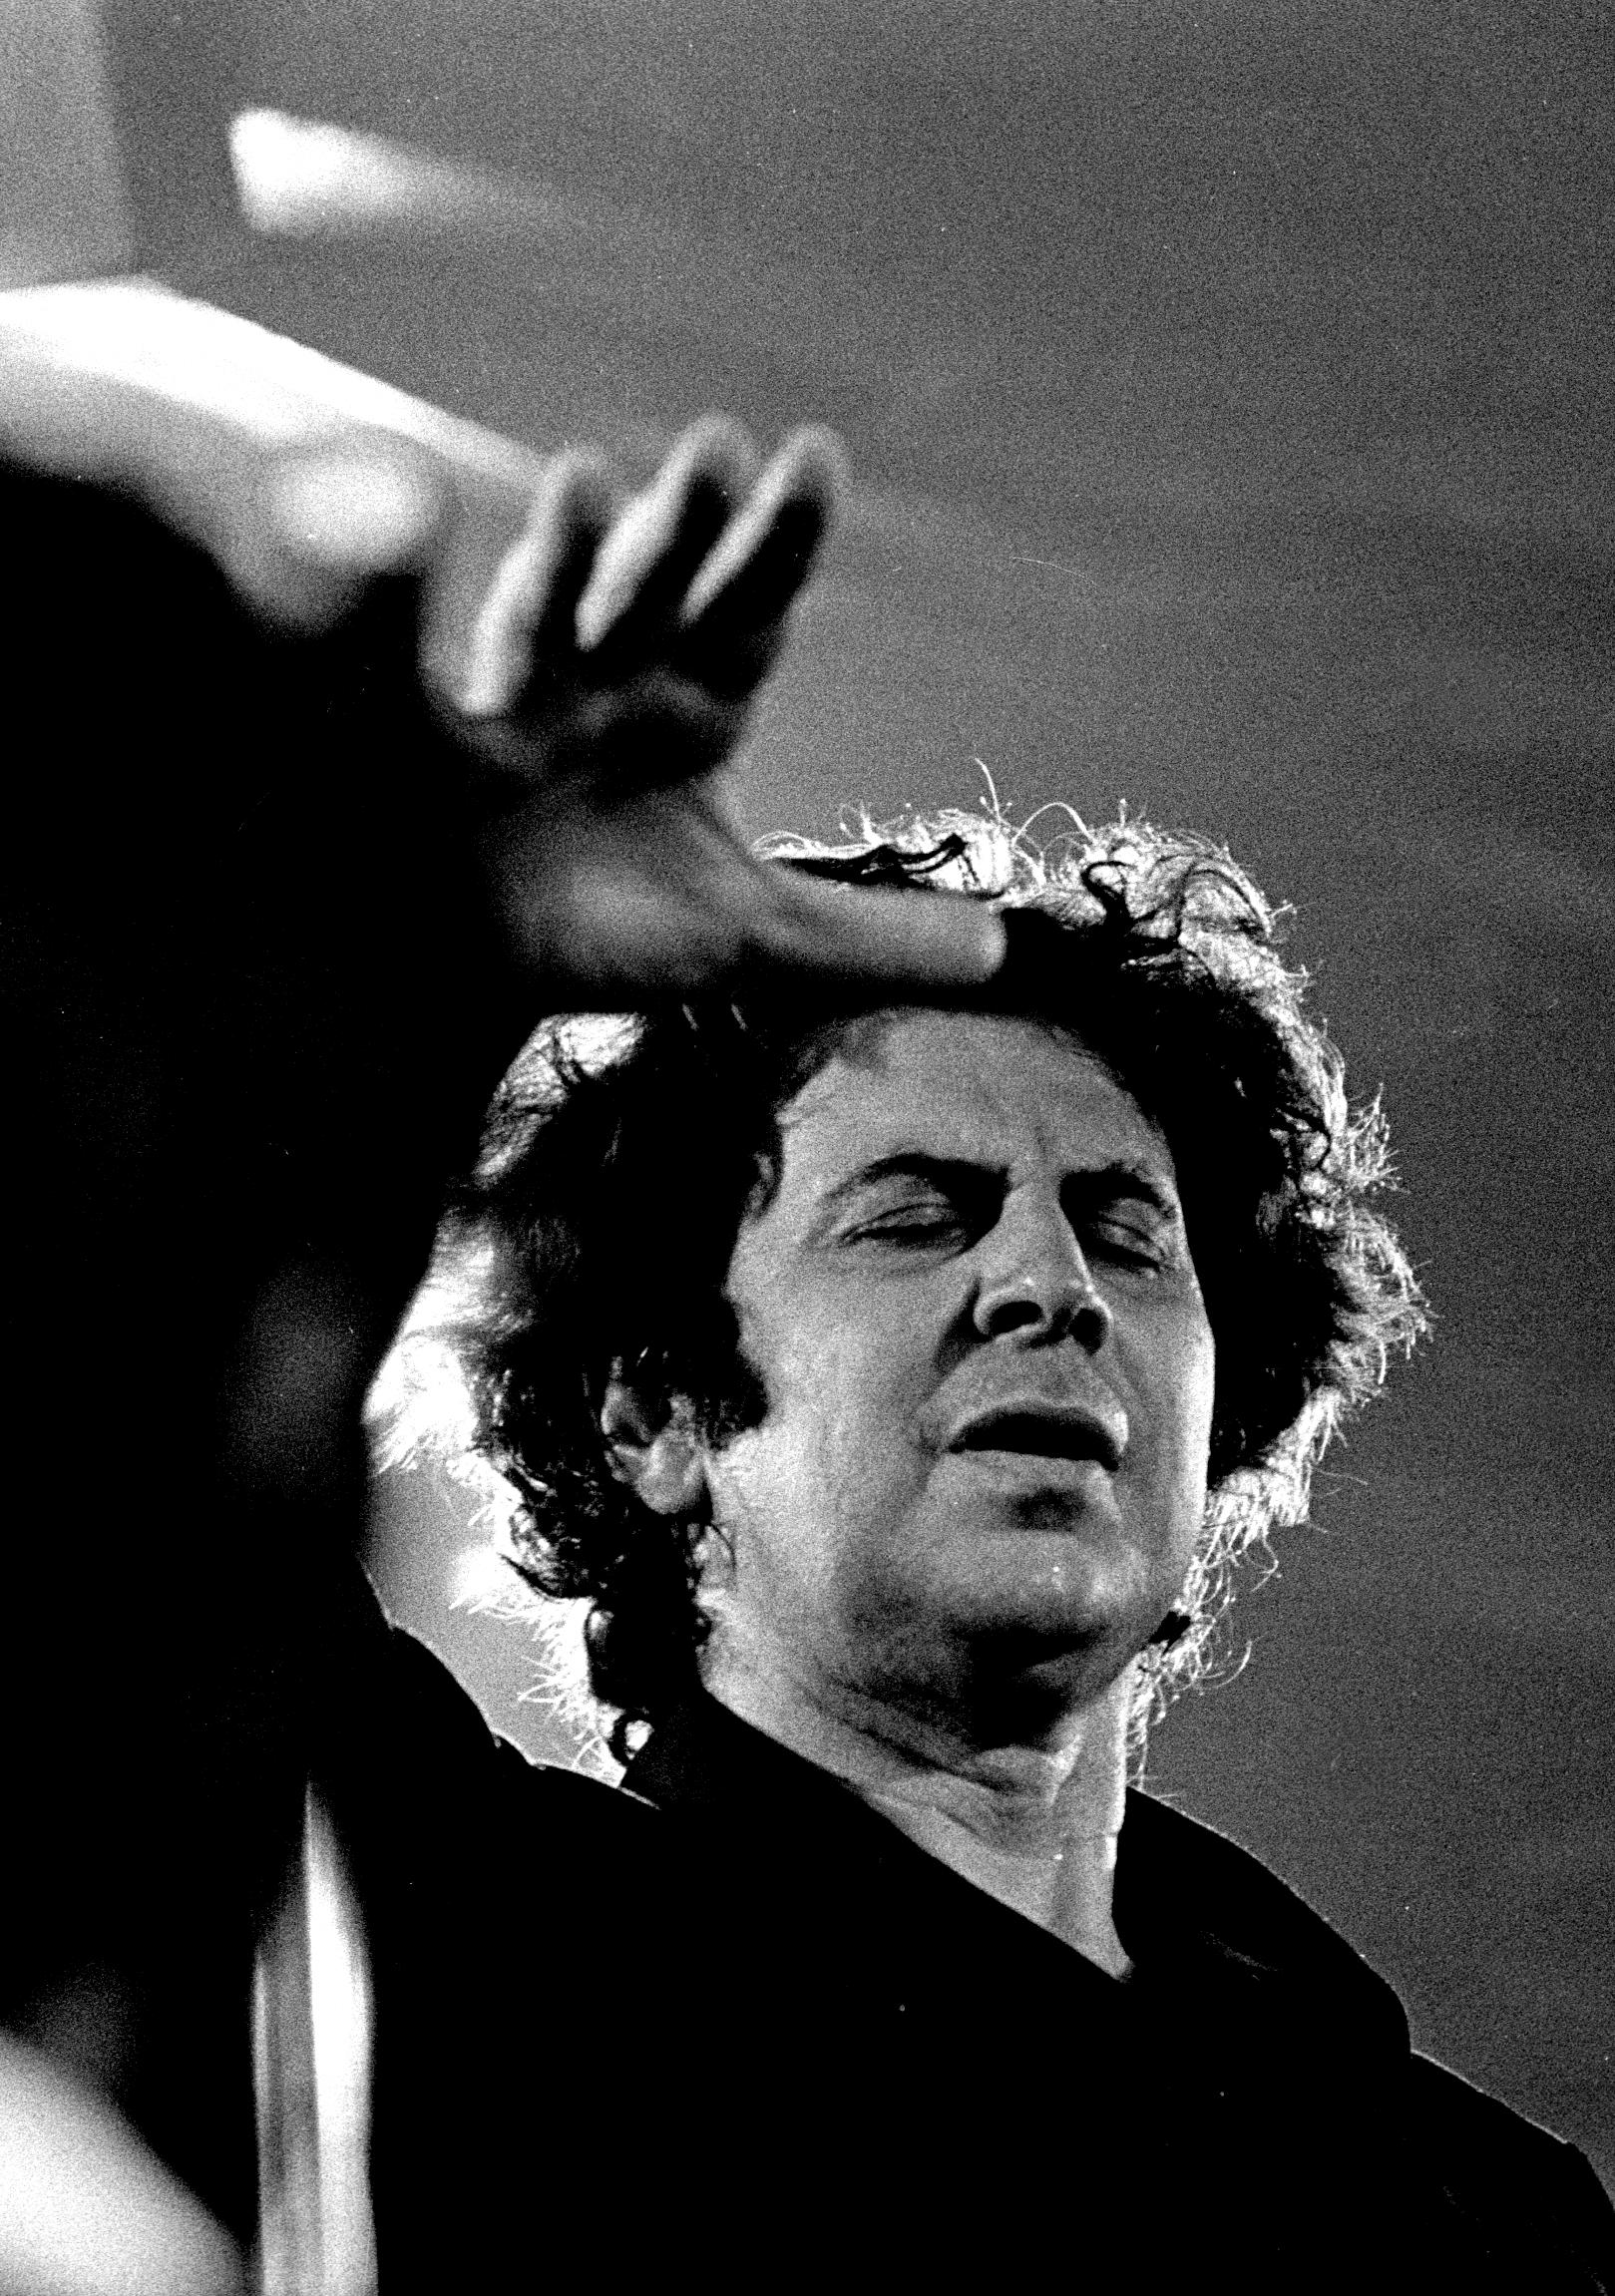 Mikis Theodorakis - Serpico (Bande Sonore Originale Du Film)